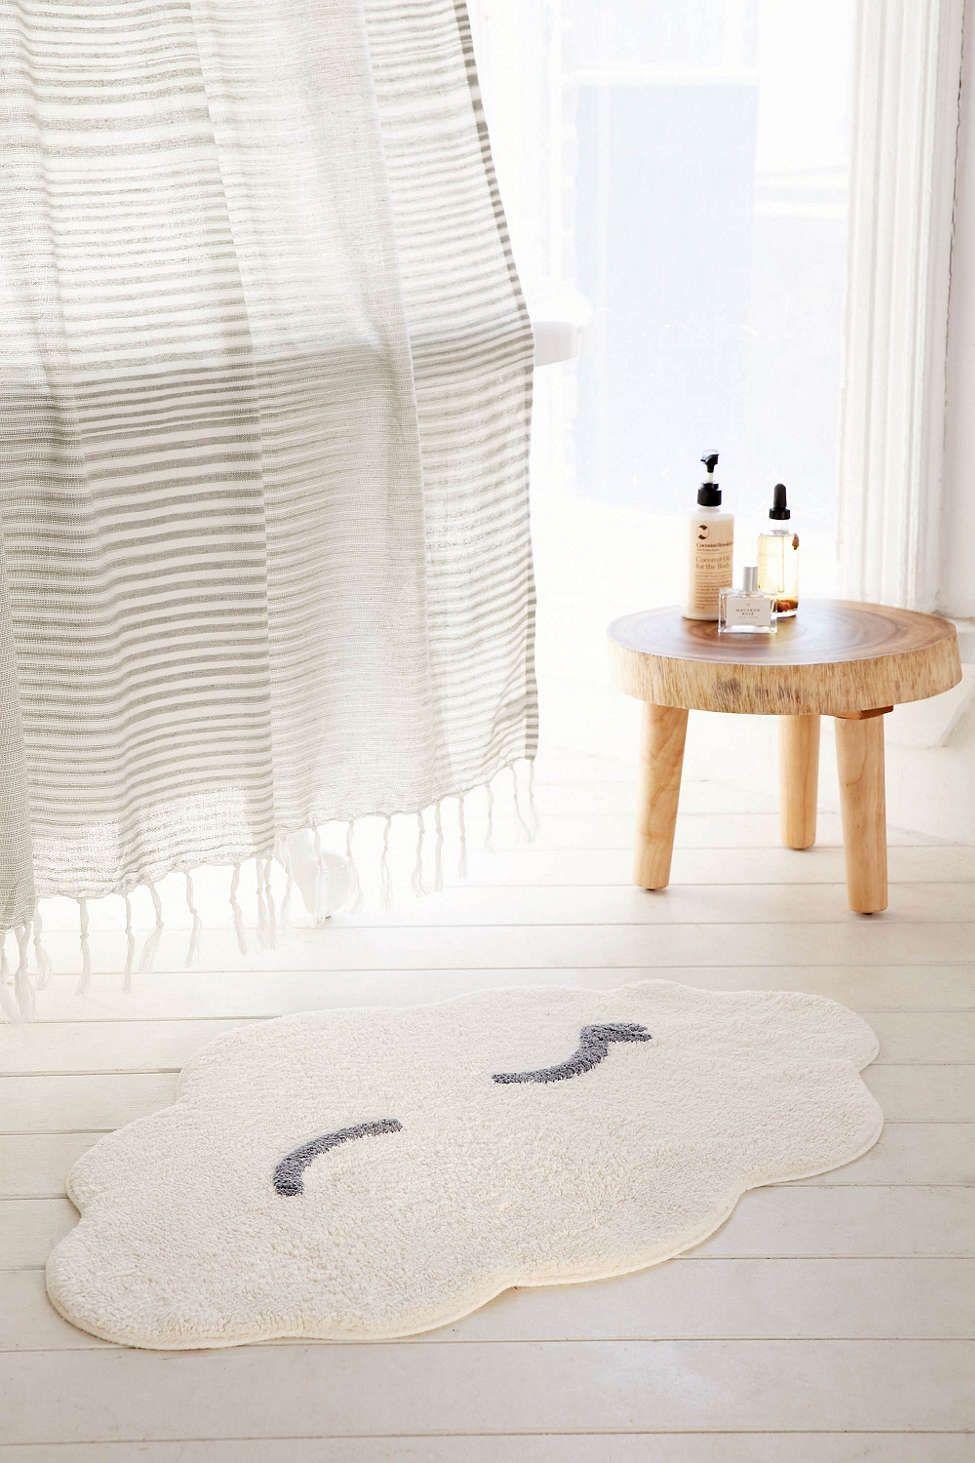 Winking Cloud Bath Mat Decoracao De Lavabo Decoracao Tumblr Decoracao